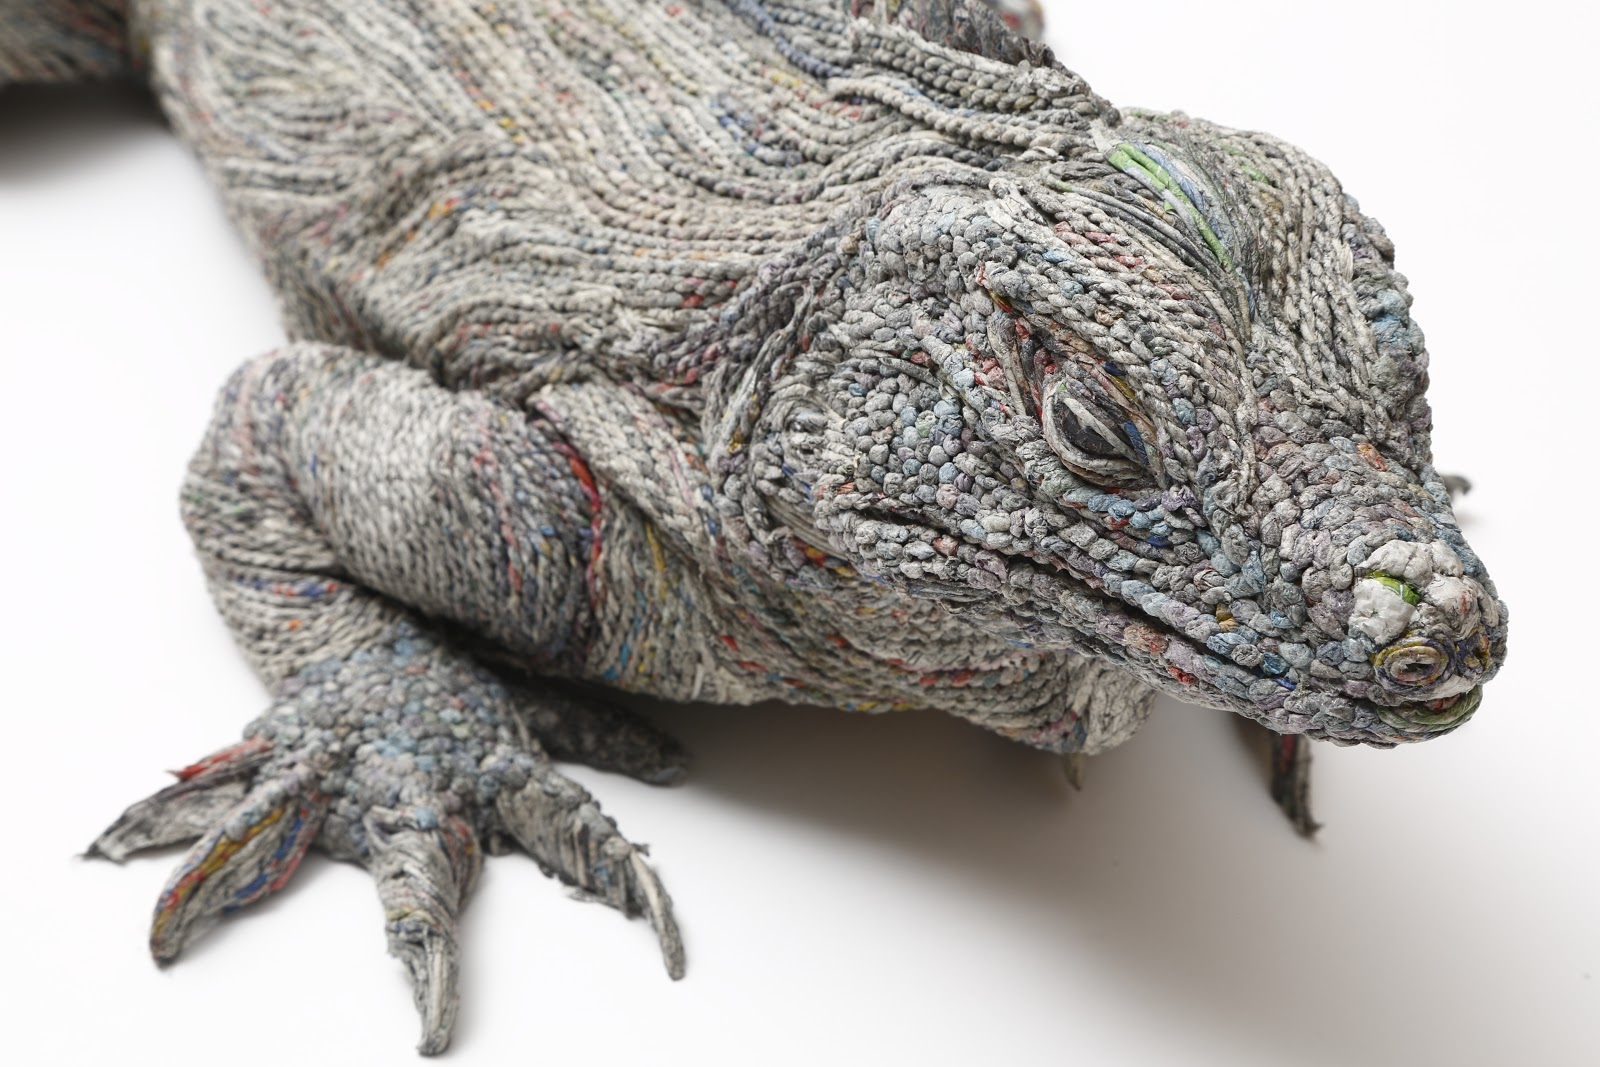 04-Comodo-Dragon-Detail-Hitotsuyama-Studio-Chie-Hitotsuyama-Upcycling-Paper-to-make-Animal-Sculptures-www-designstack-co